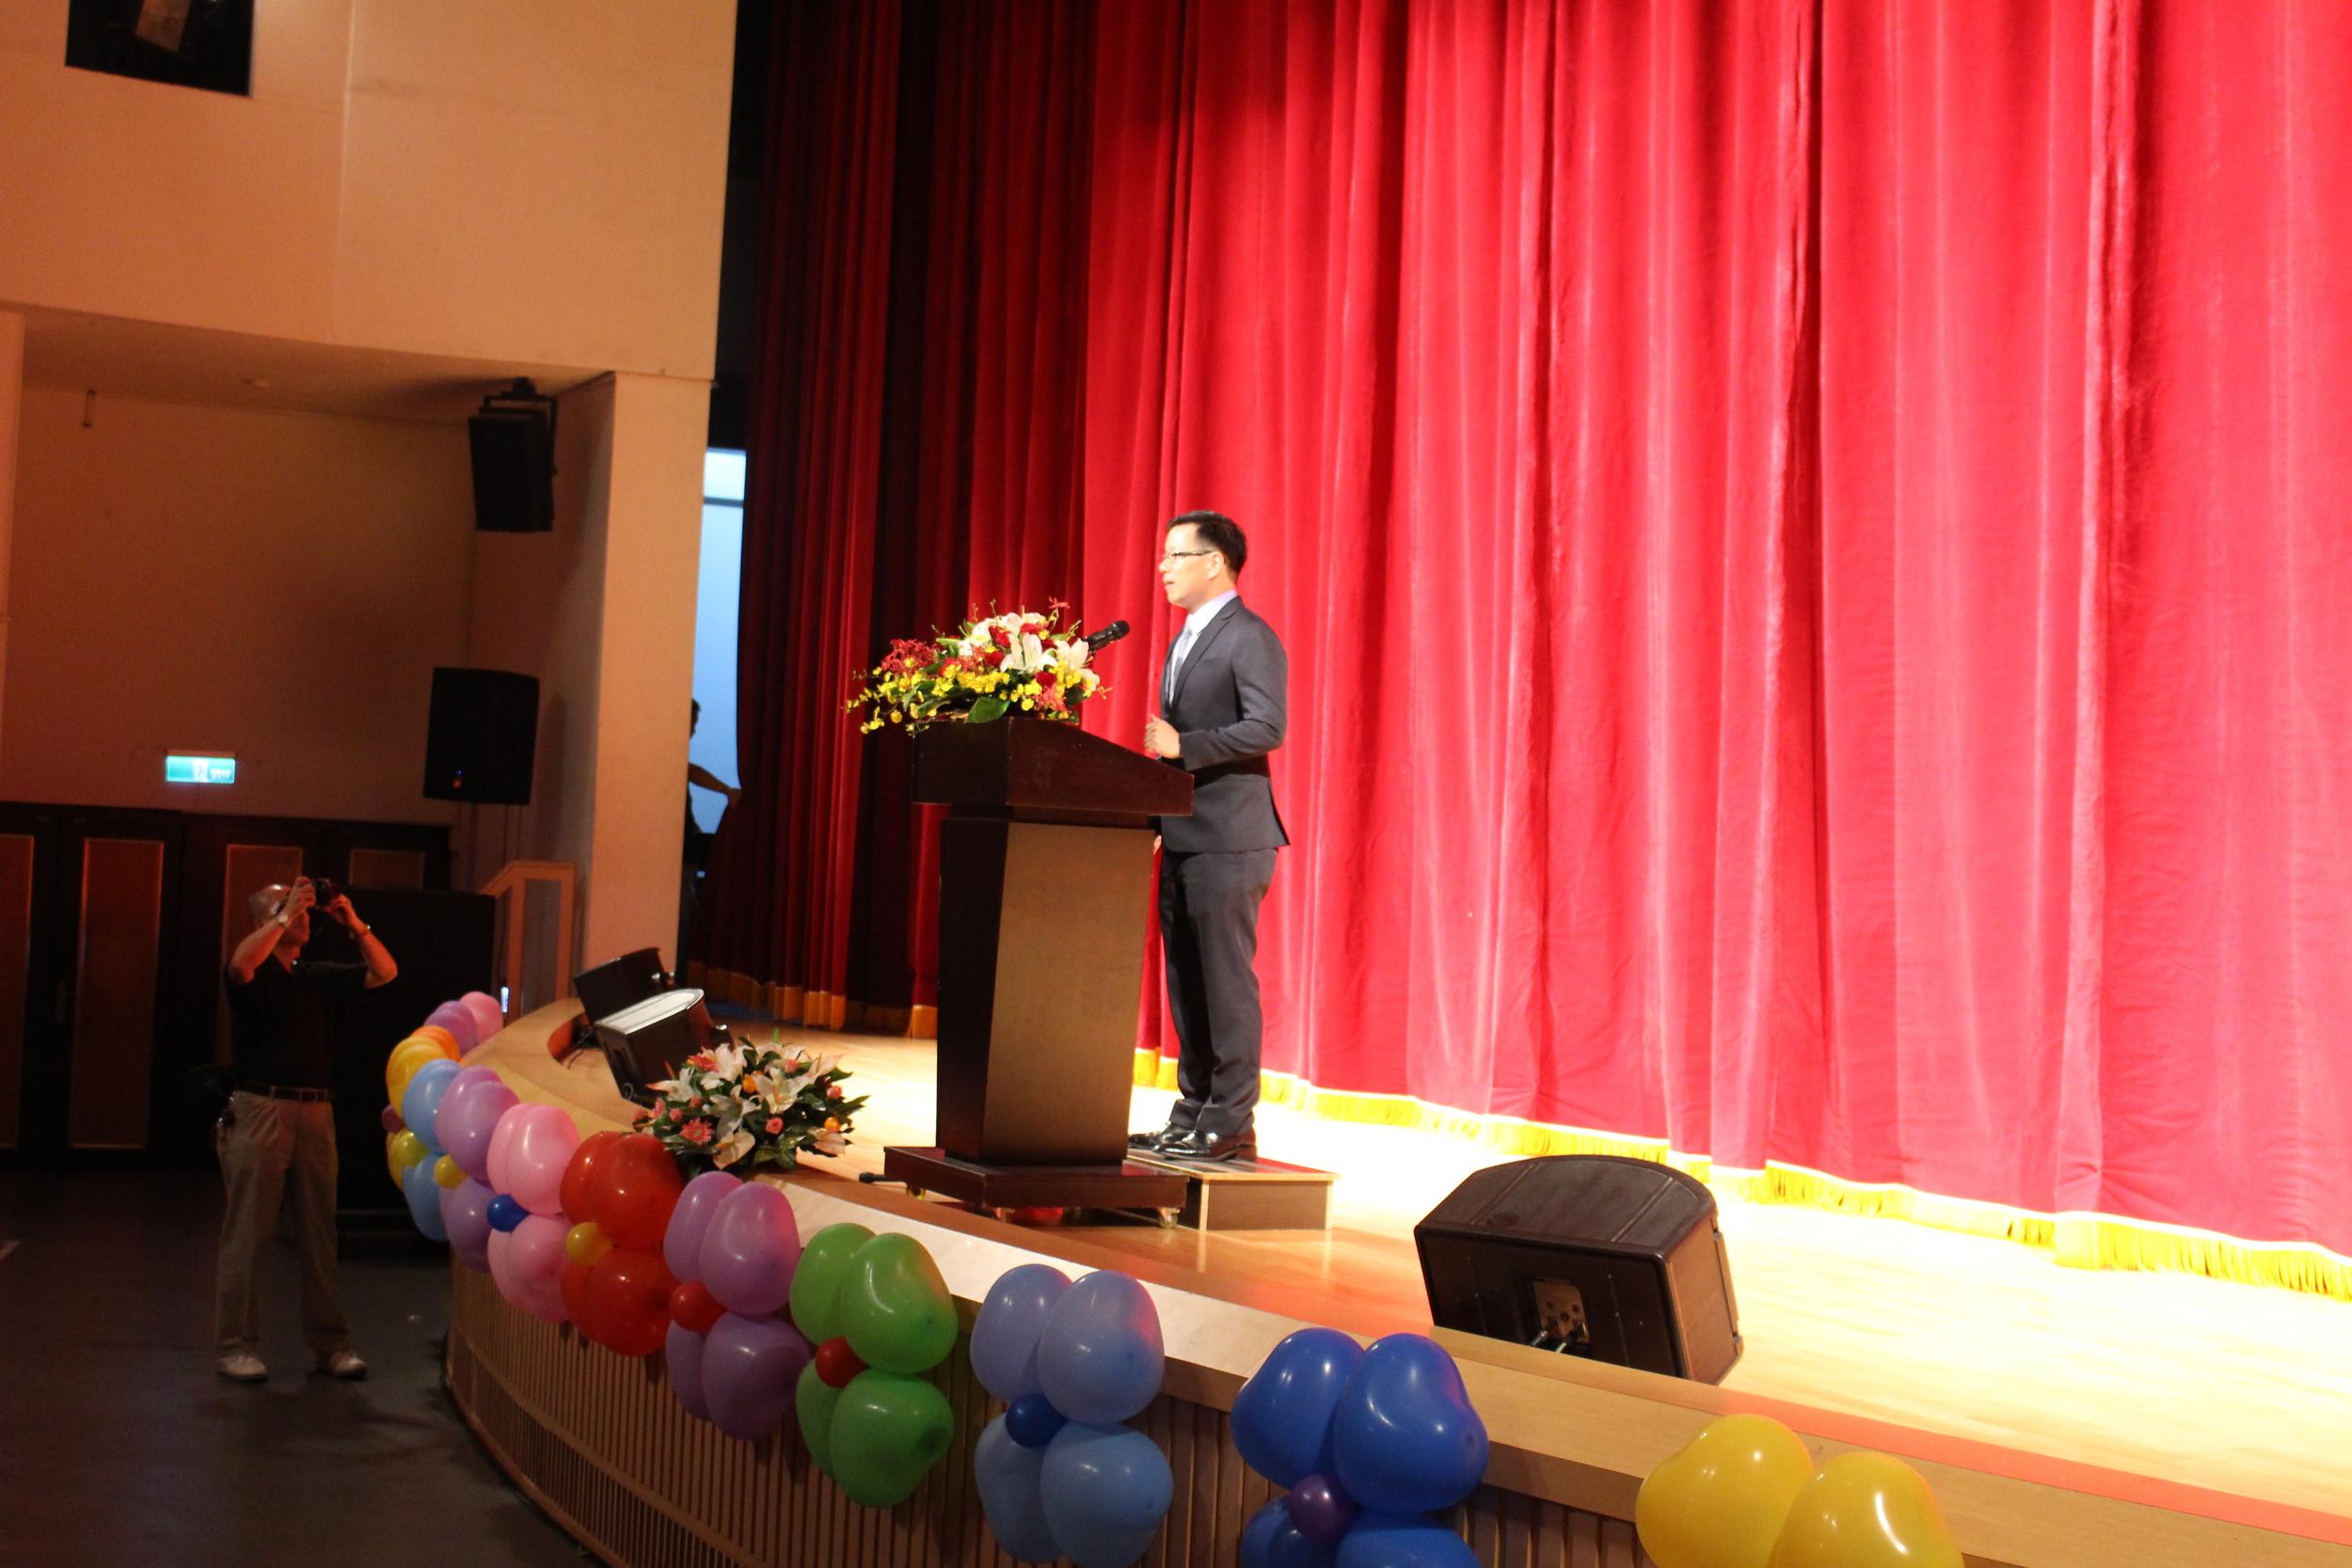 Deputy Director-General Albert Lin (Miaoli International Culture and Tourism Bureau)/苗栗縣政府國際文化觀光局副局長林彥甫